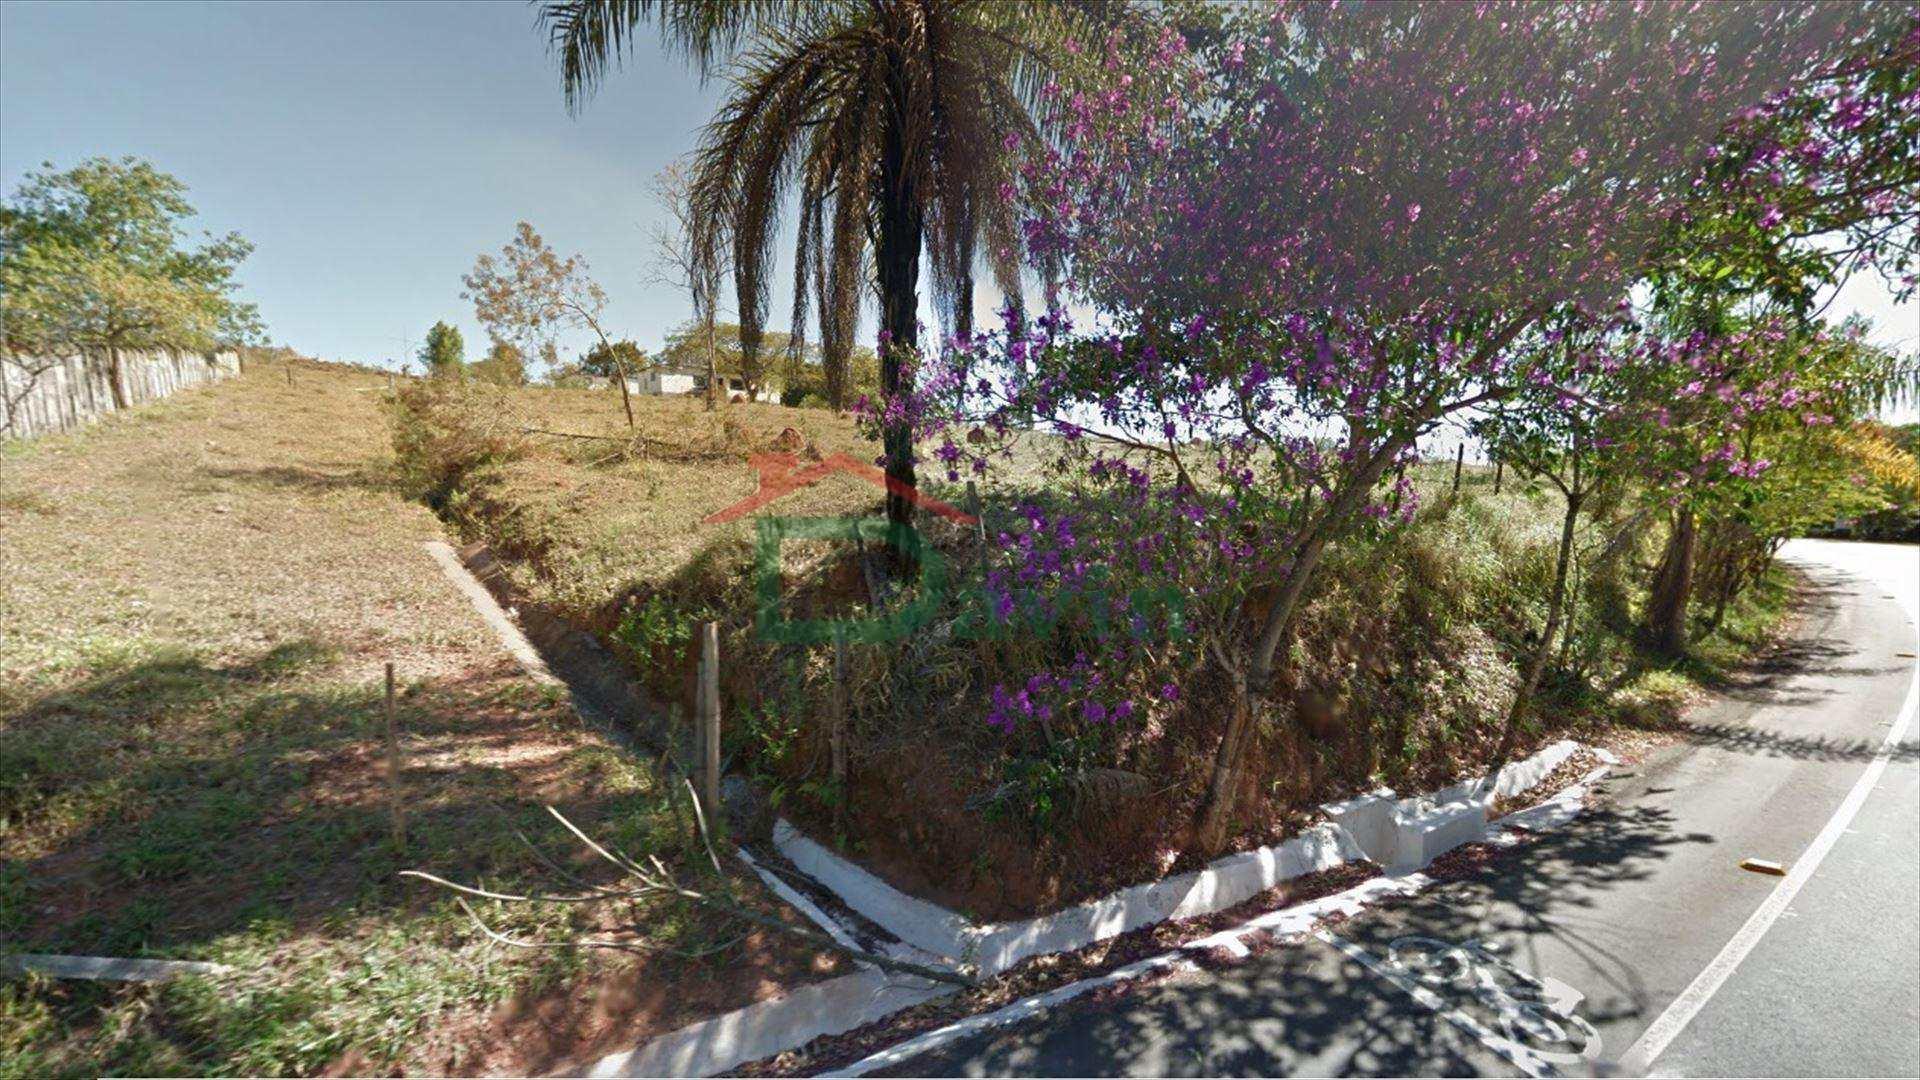 10400-AREA_AGUAS_SANTAS_COD_104.jpg